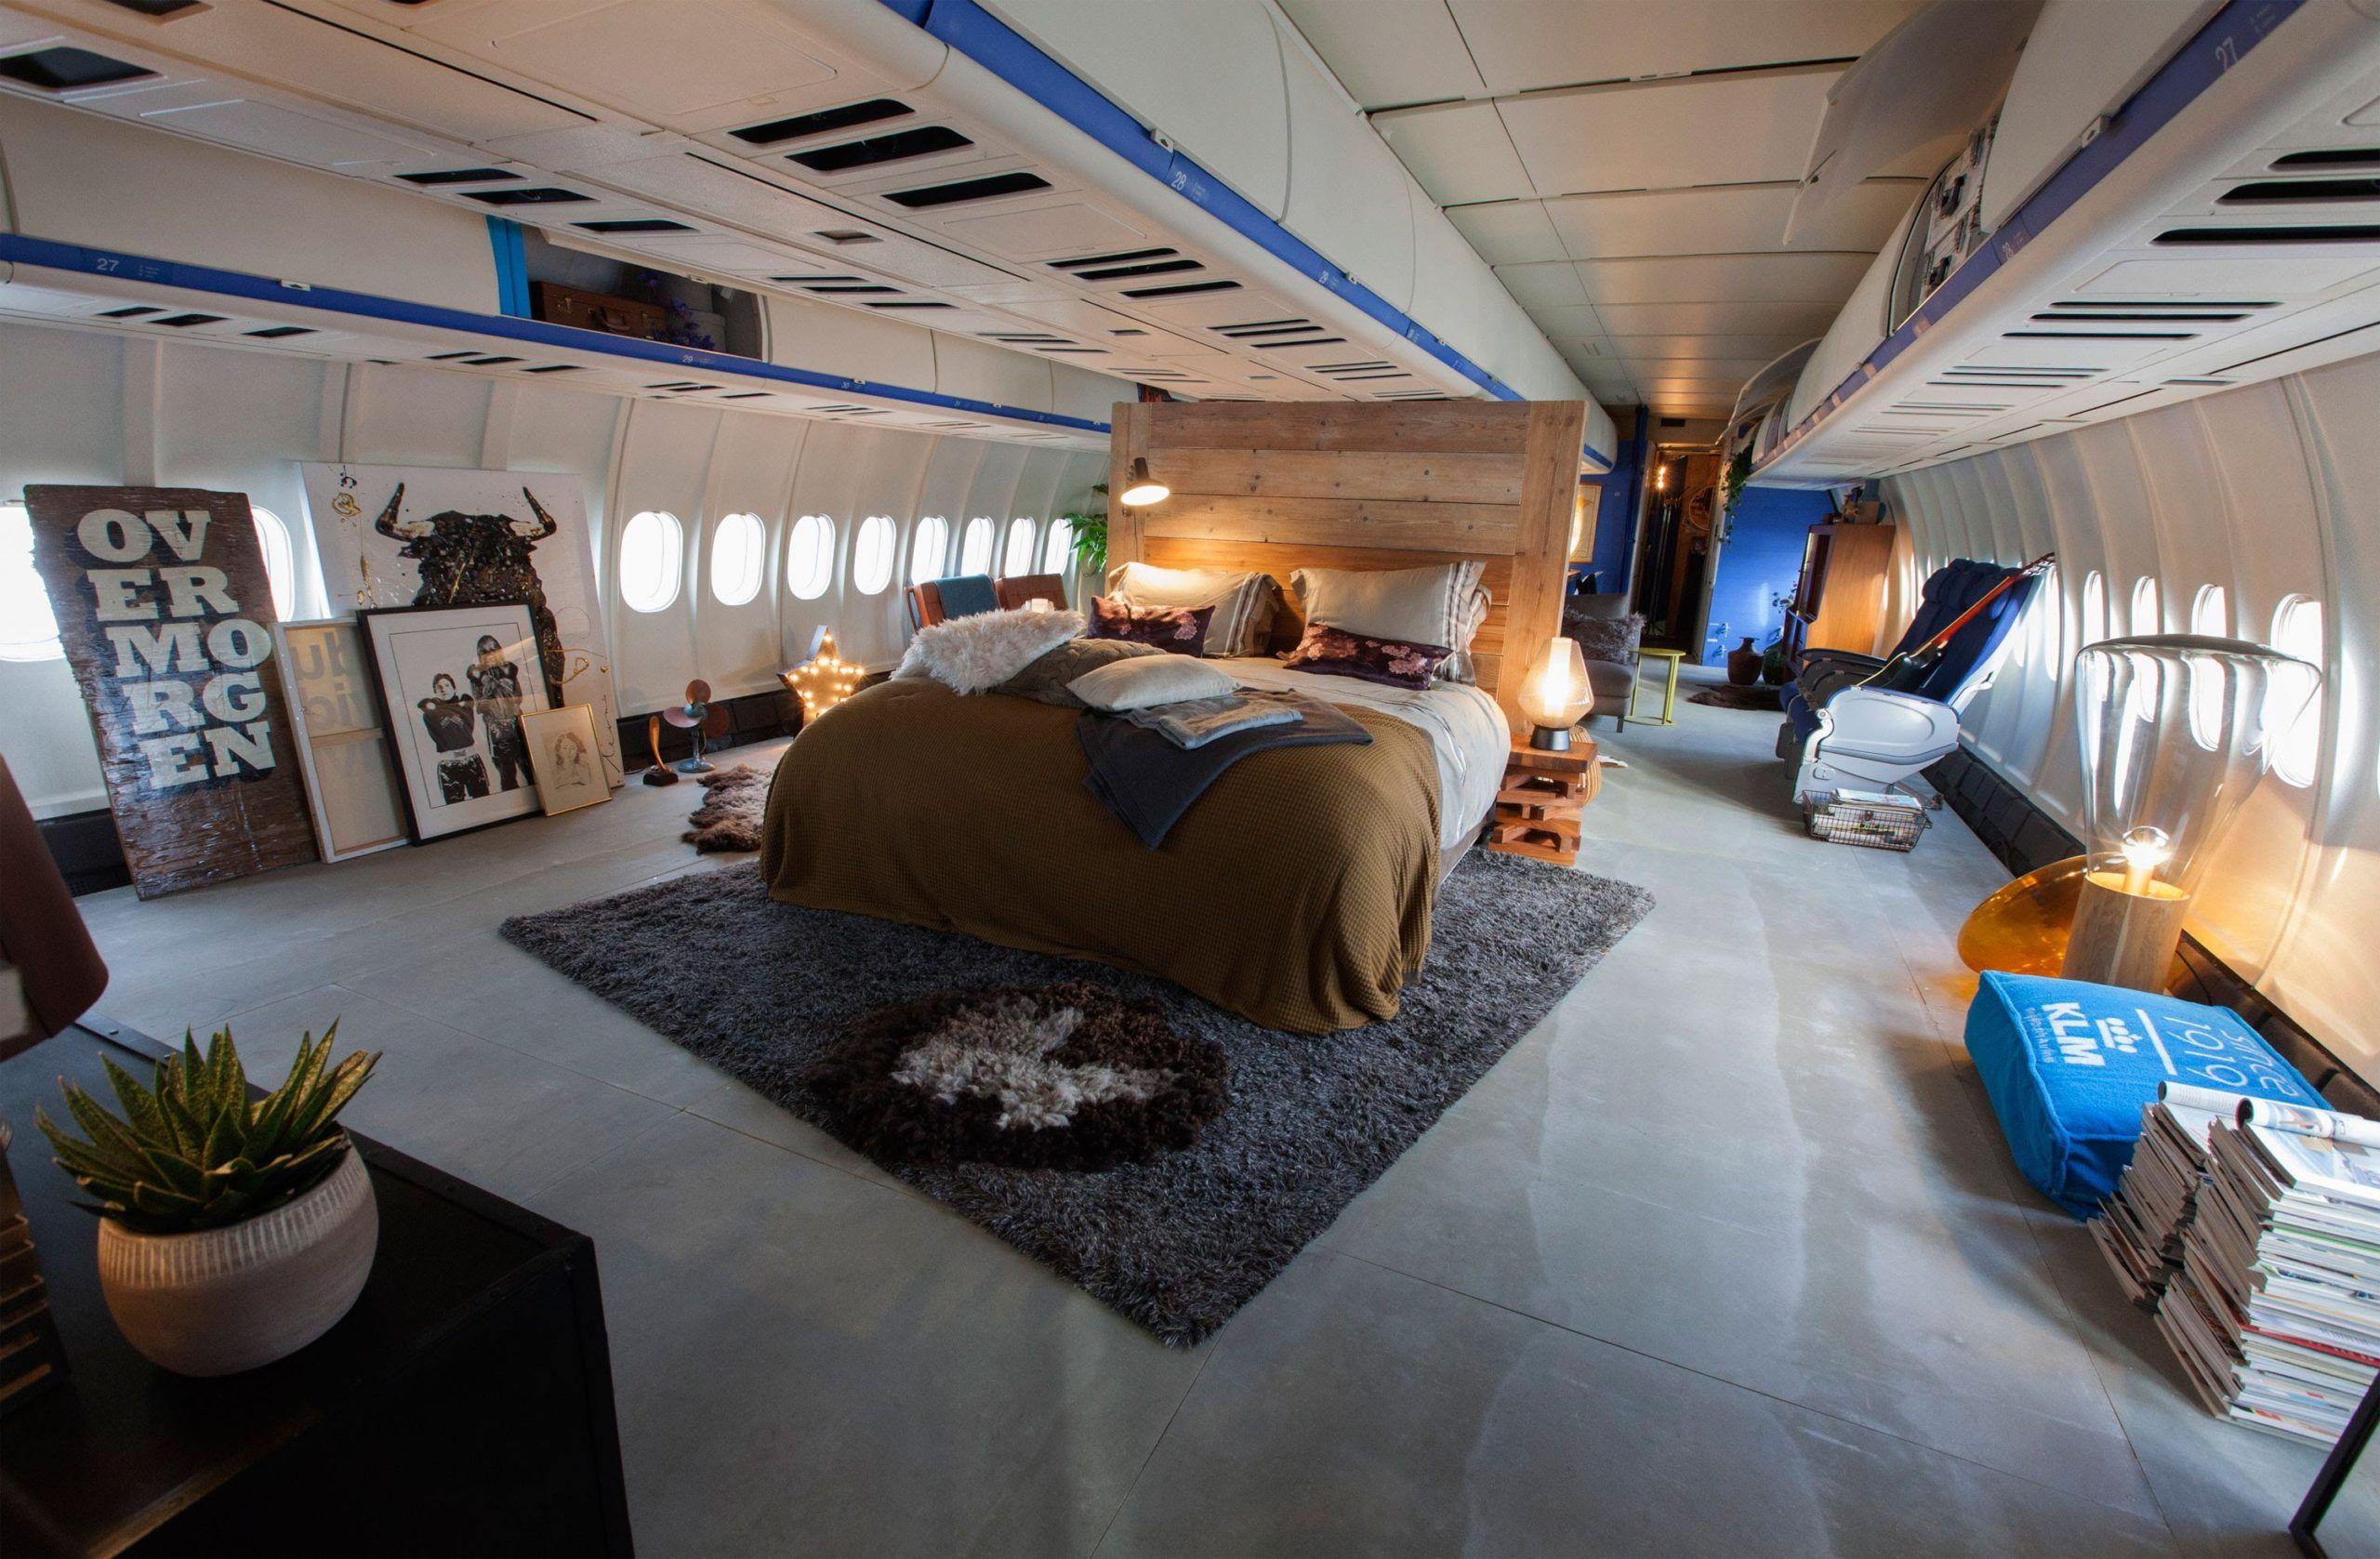 airbnb-klm-amsterdam1